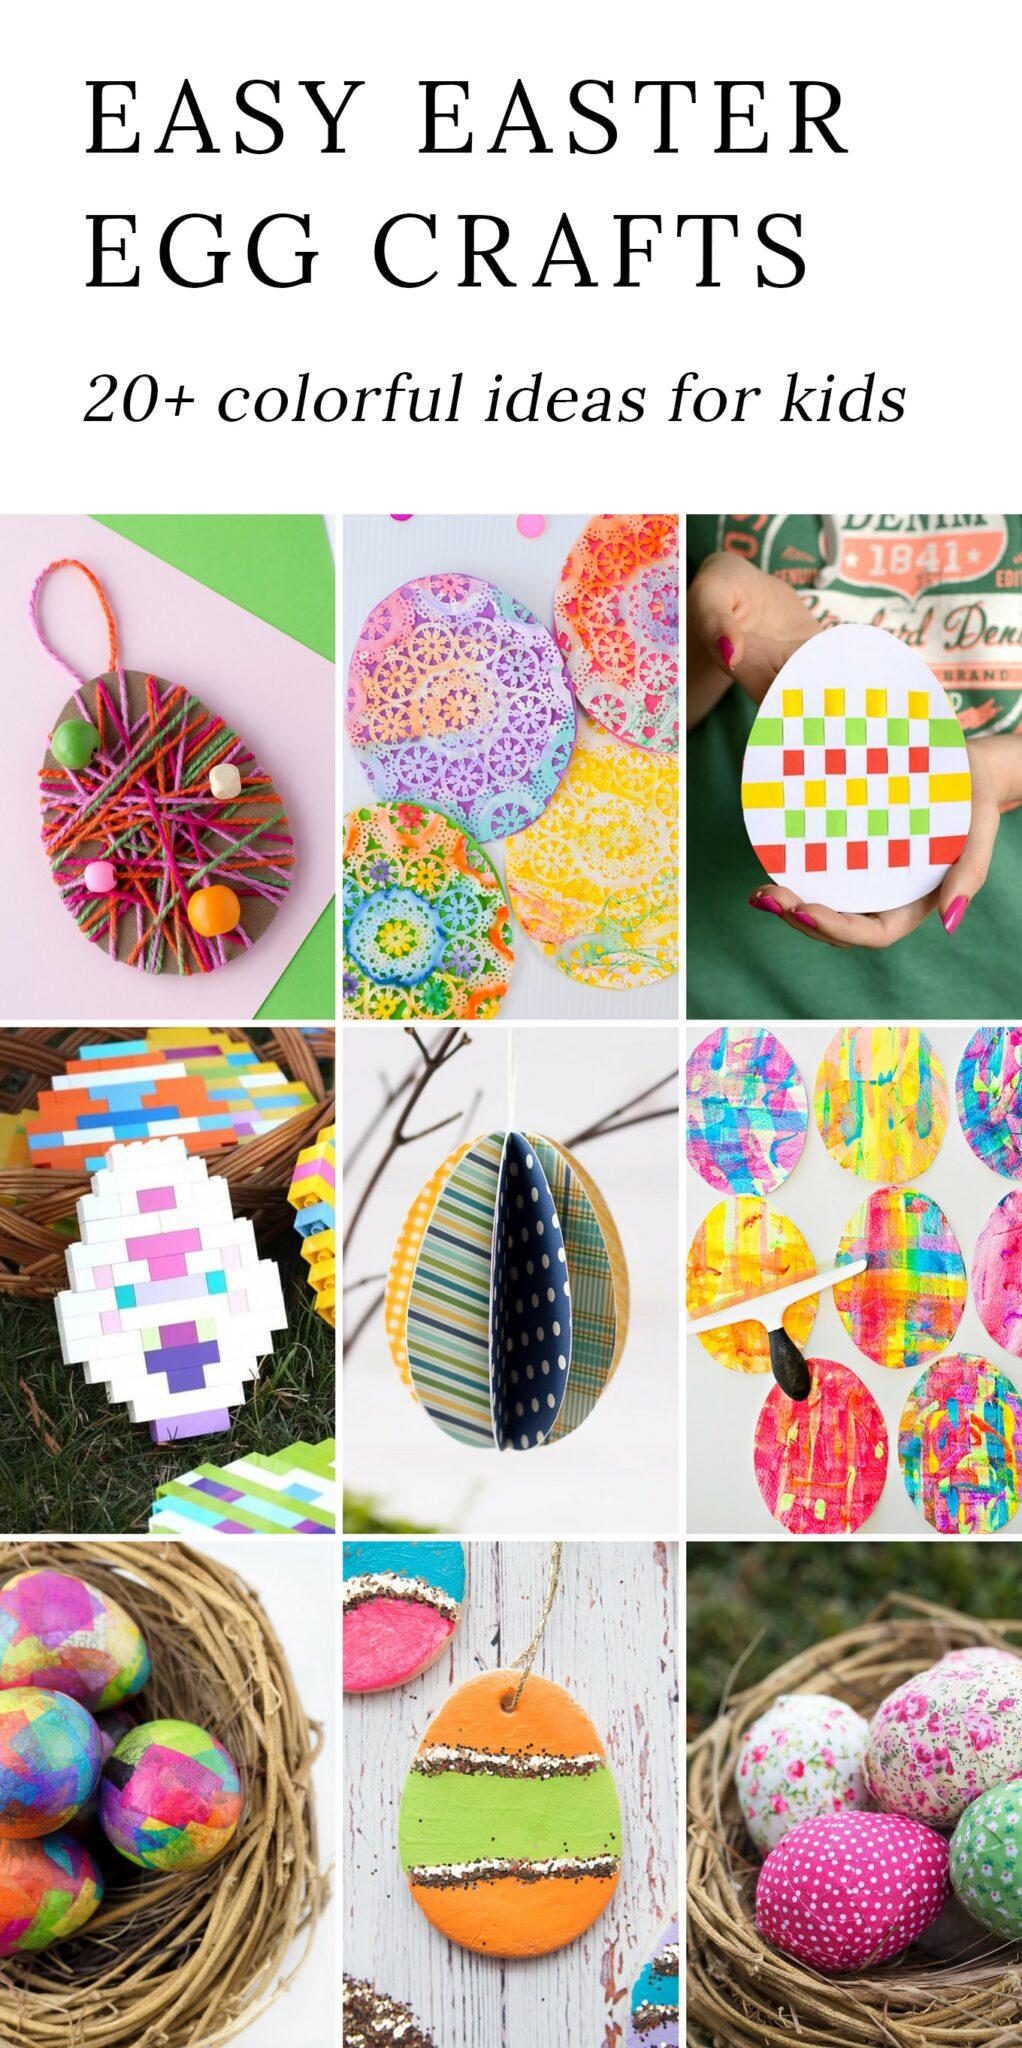 20 Colorful Easter Egg Crafts for Kids